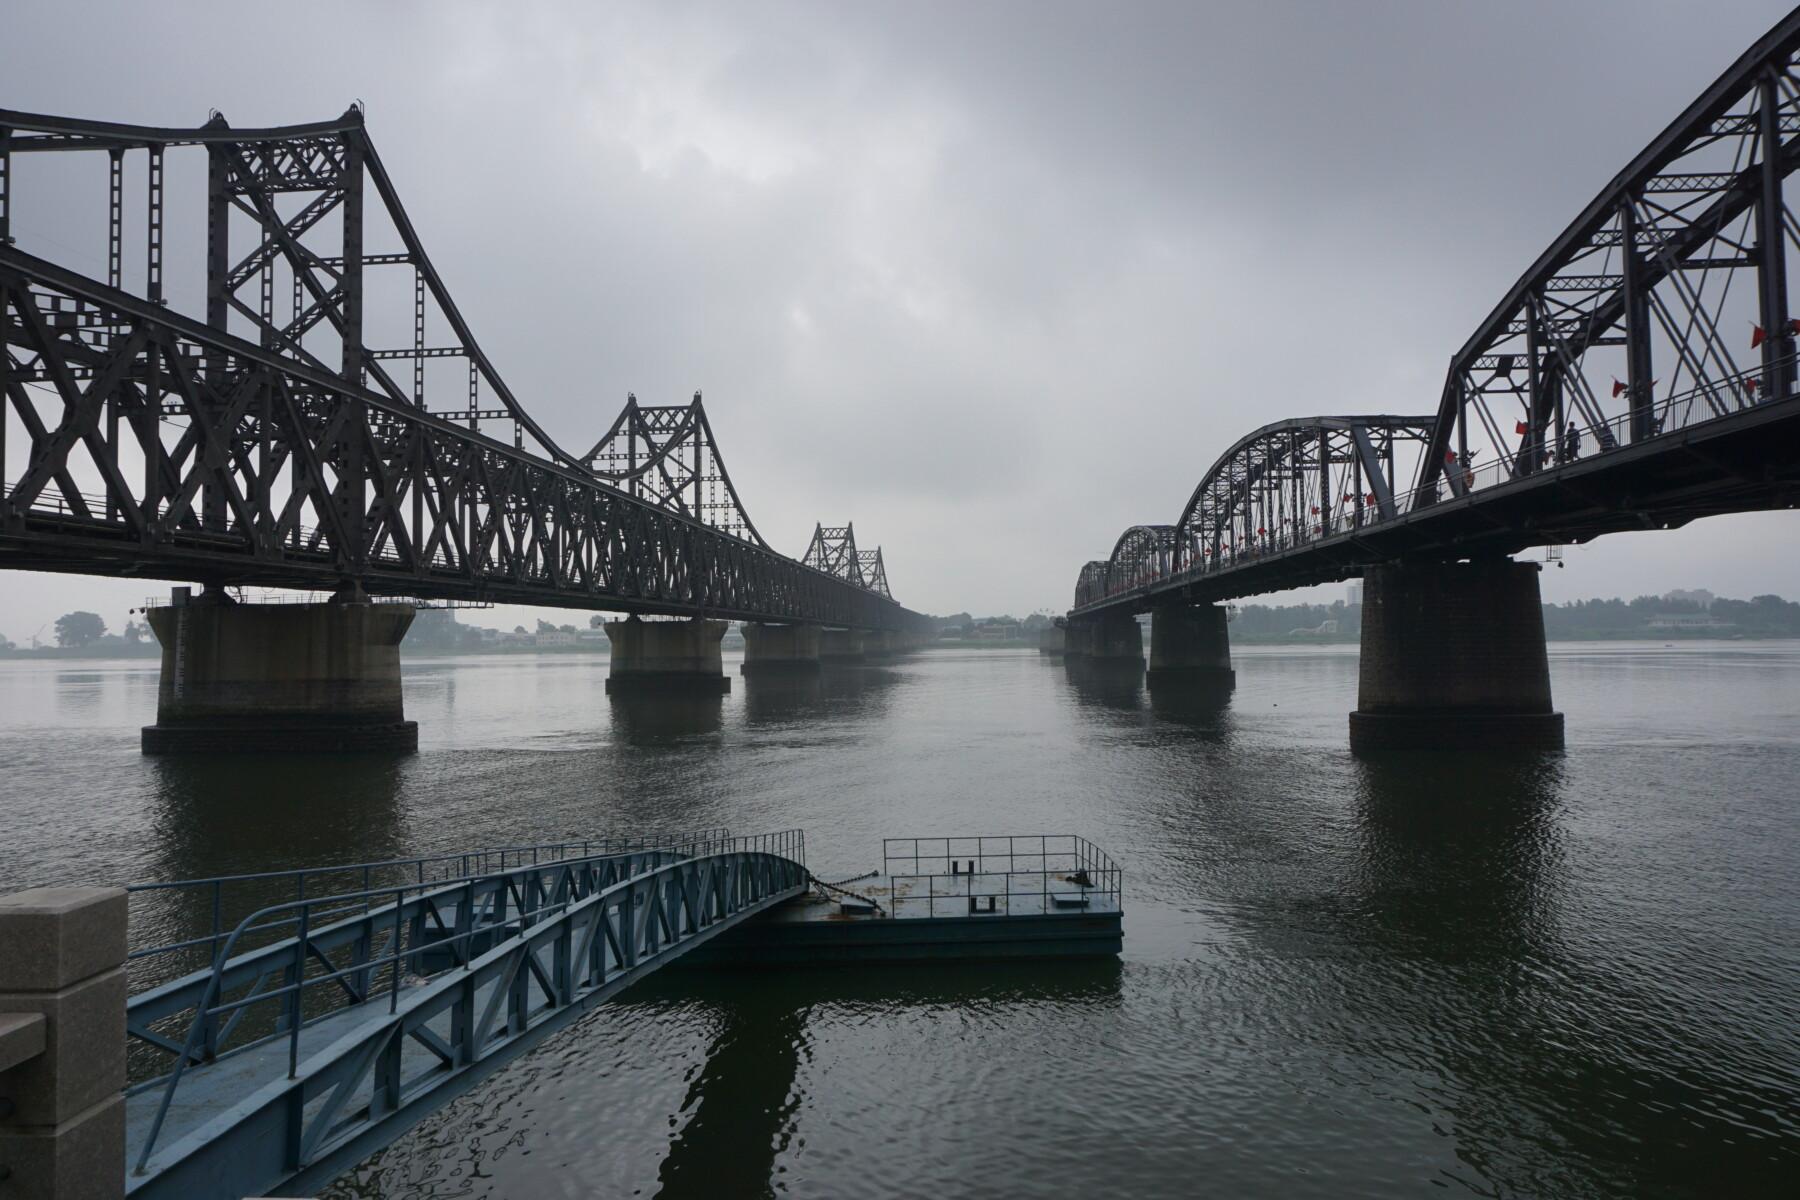 Broken bridge on the Yalu River, the border between China and North Korea